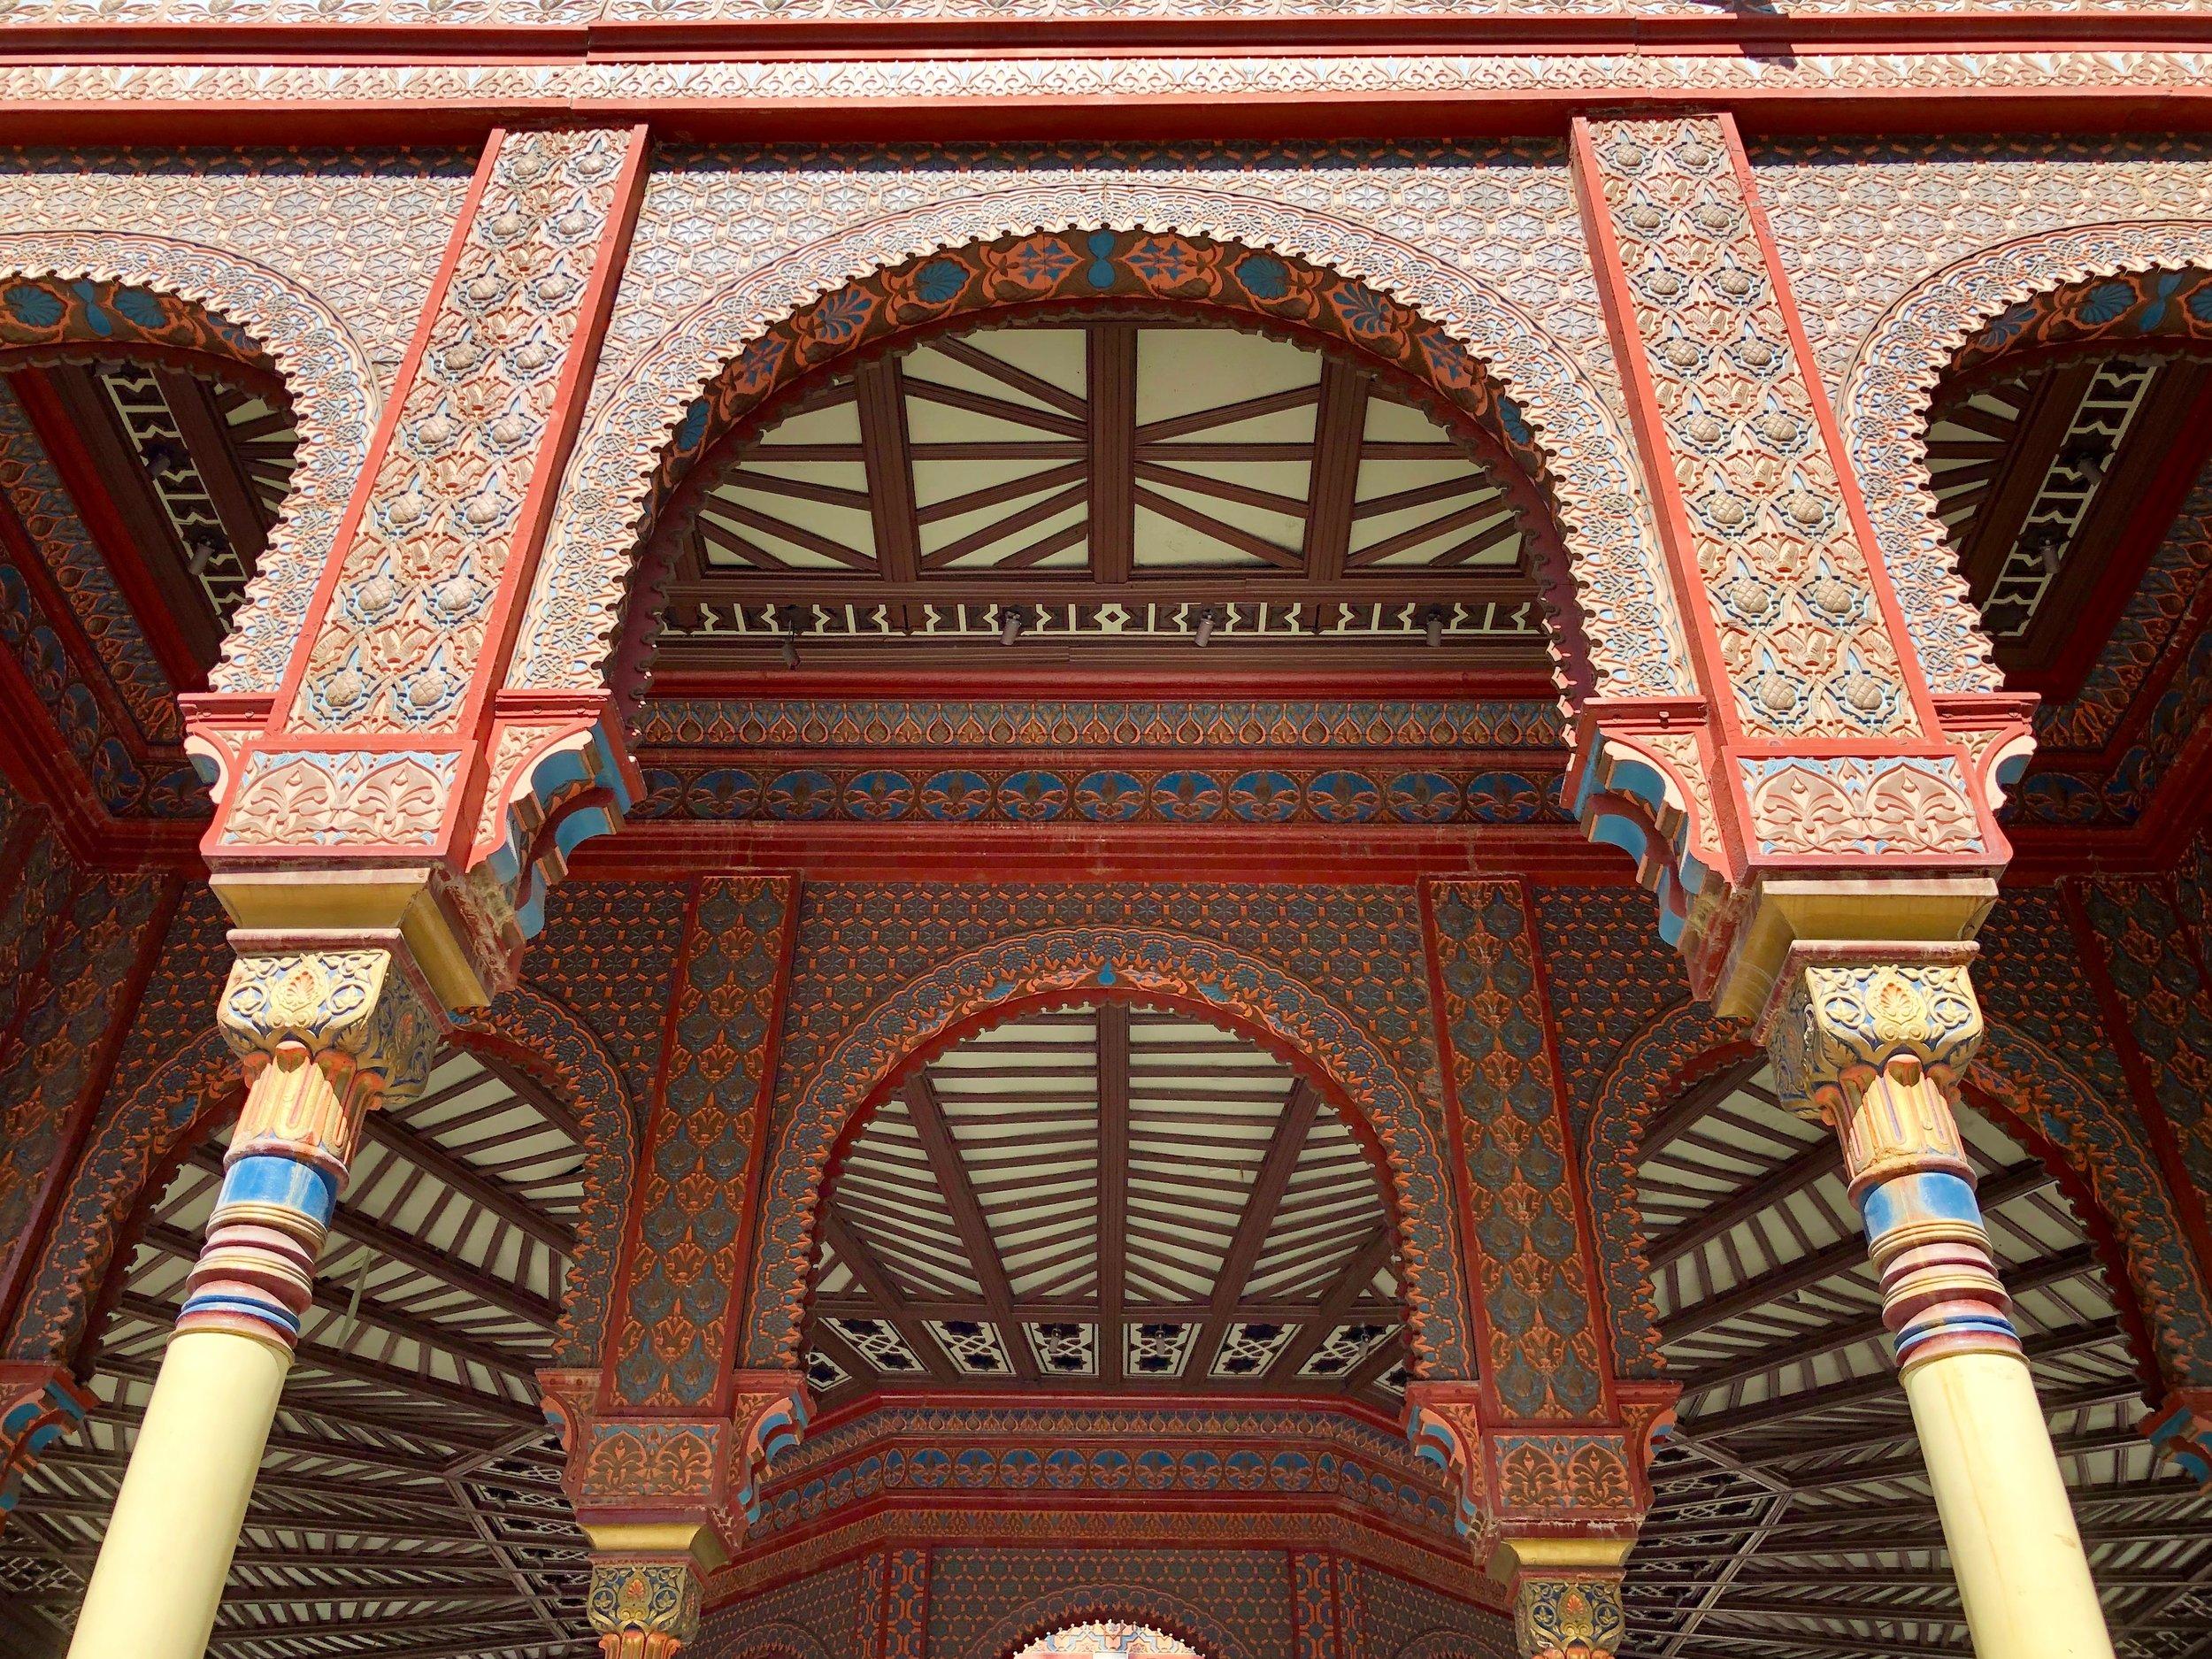 The style is Mudéjar, a mix of Spanish and Moorish architecture